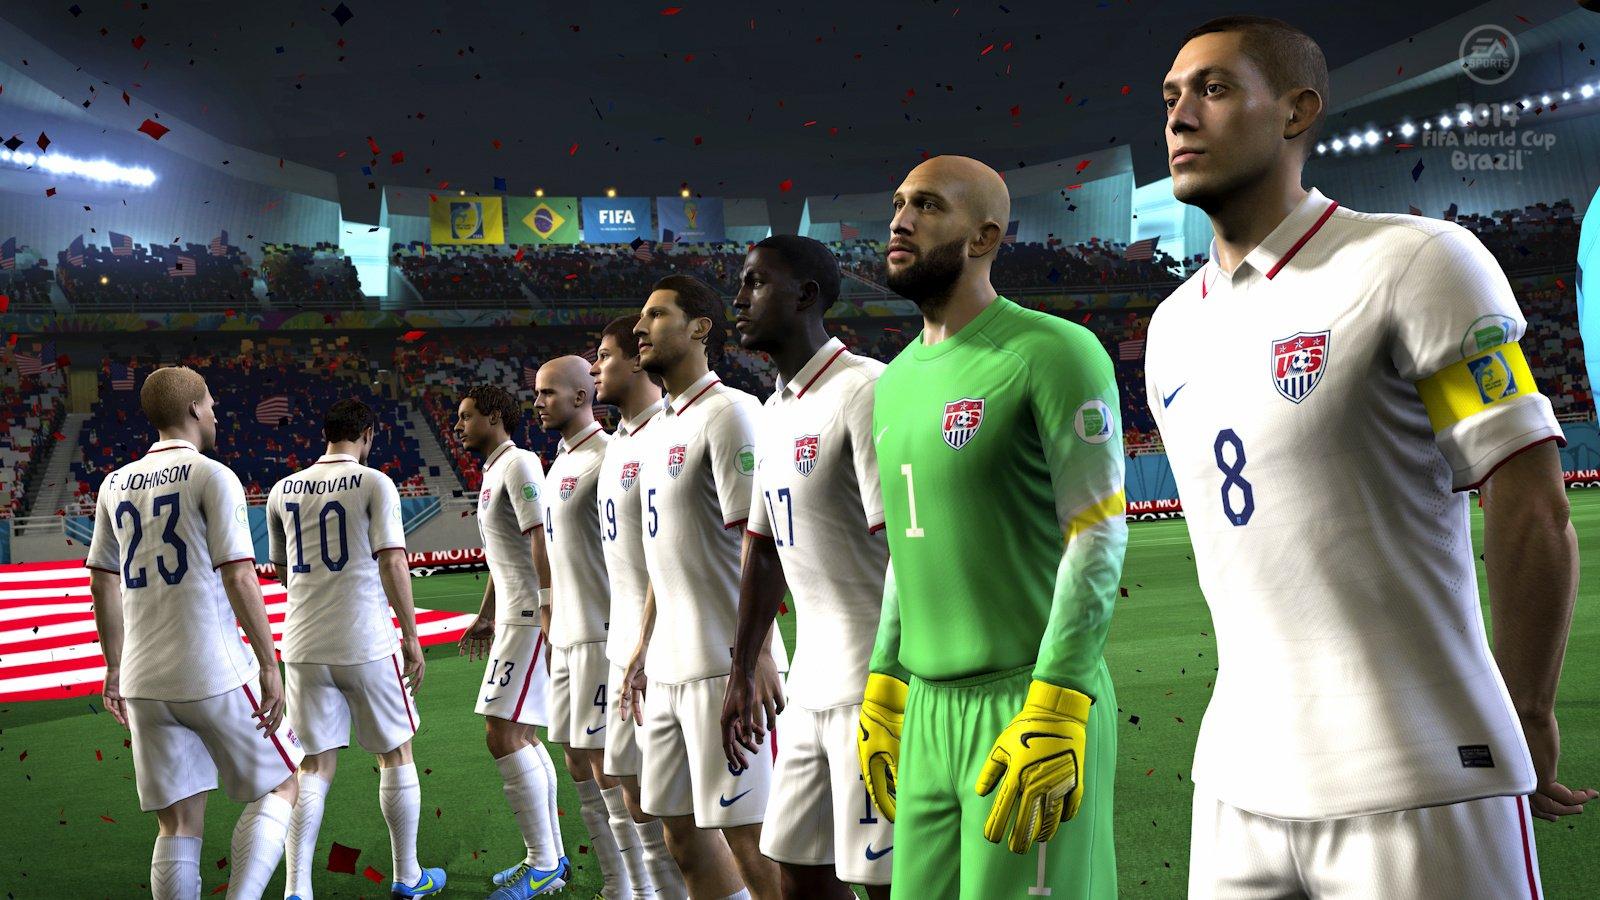 FIFA World system requirements | Can I Run FIFA World